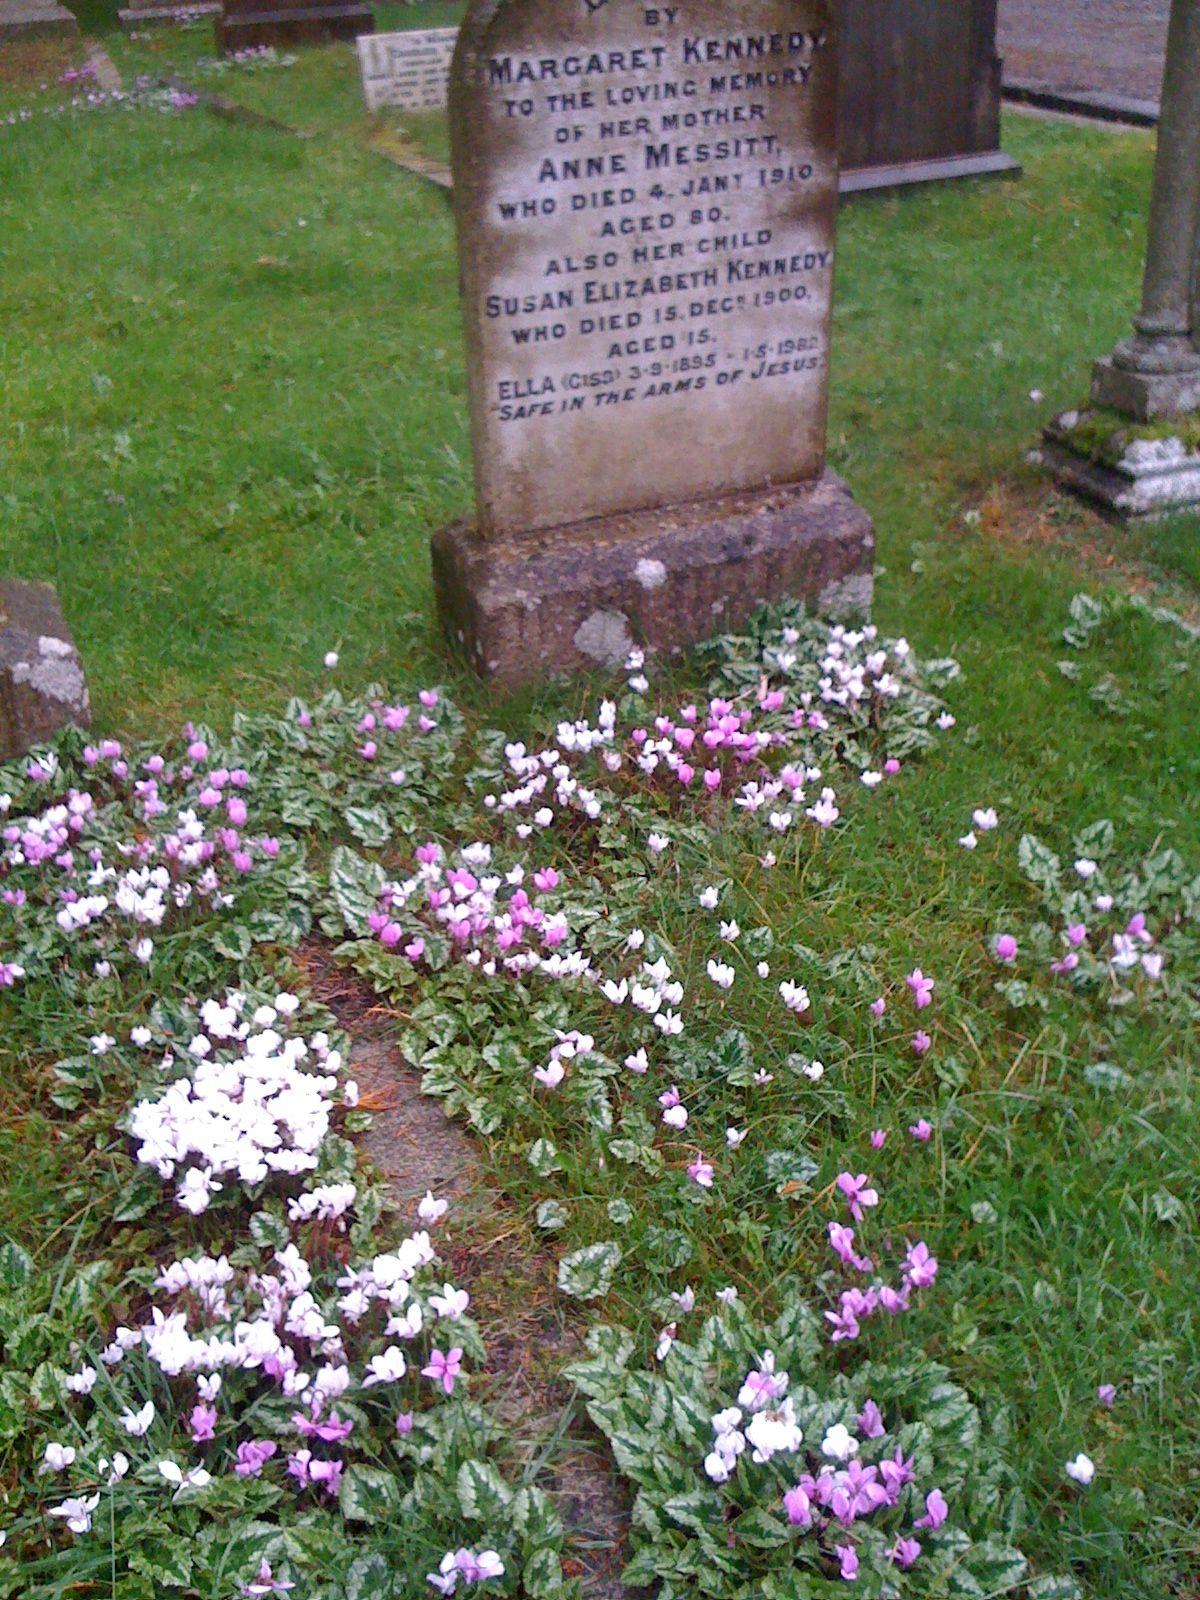 Headstone, Enniskerry graveyard - 12/10/12